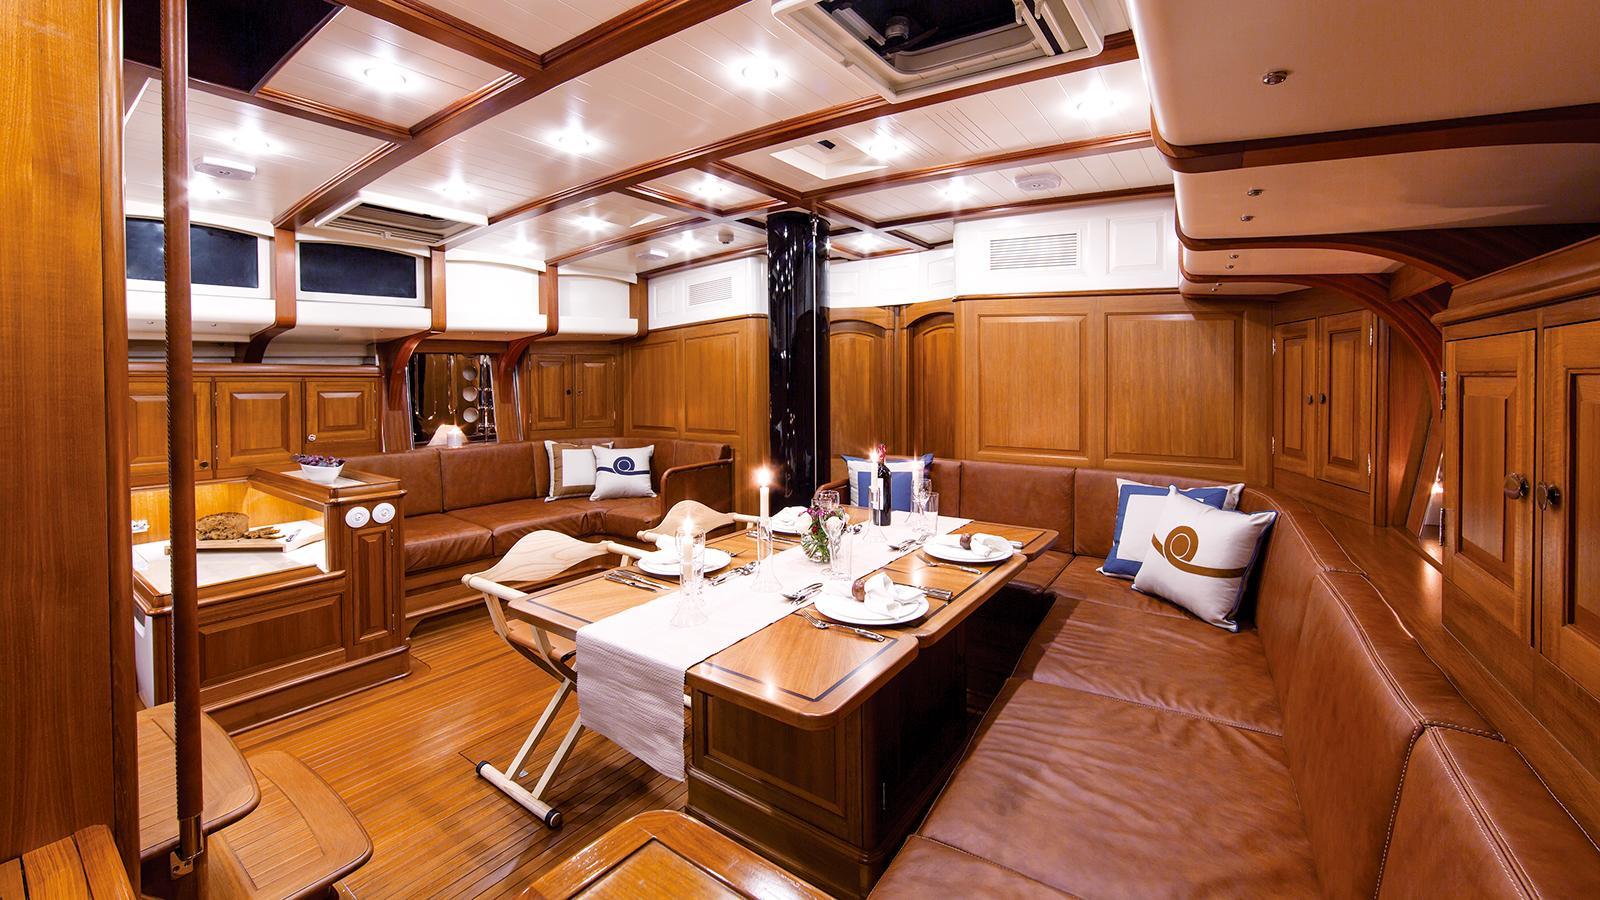 tempus-fugit-sailing-yacht-arkin-pruva-2013-27m-saloon